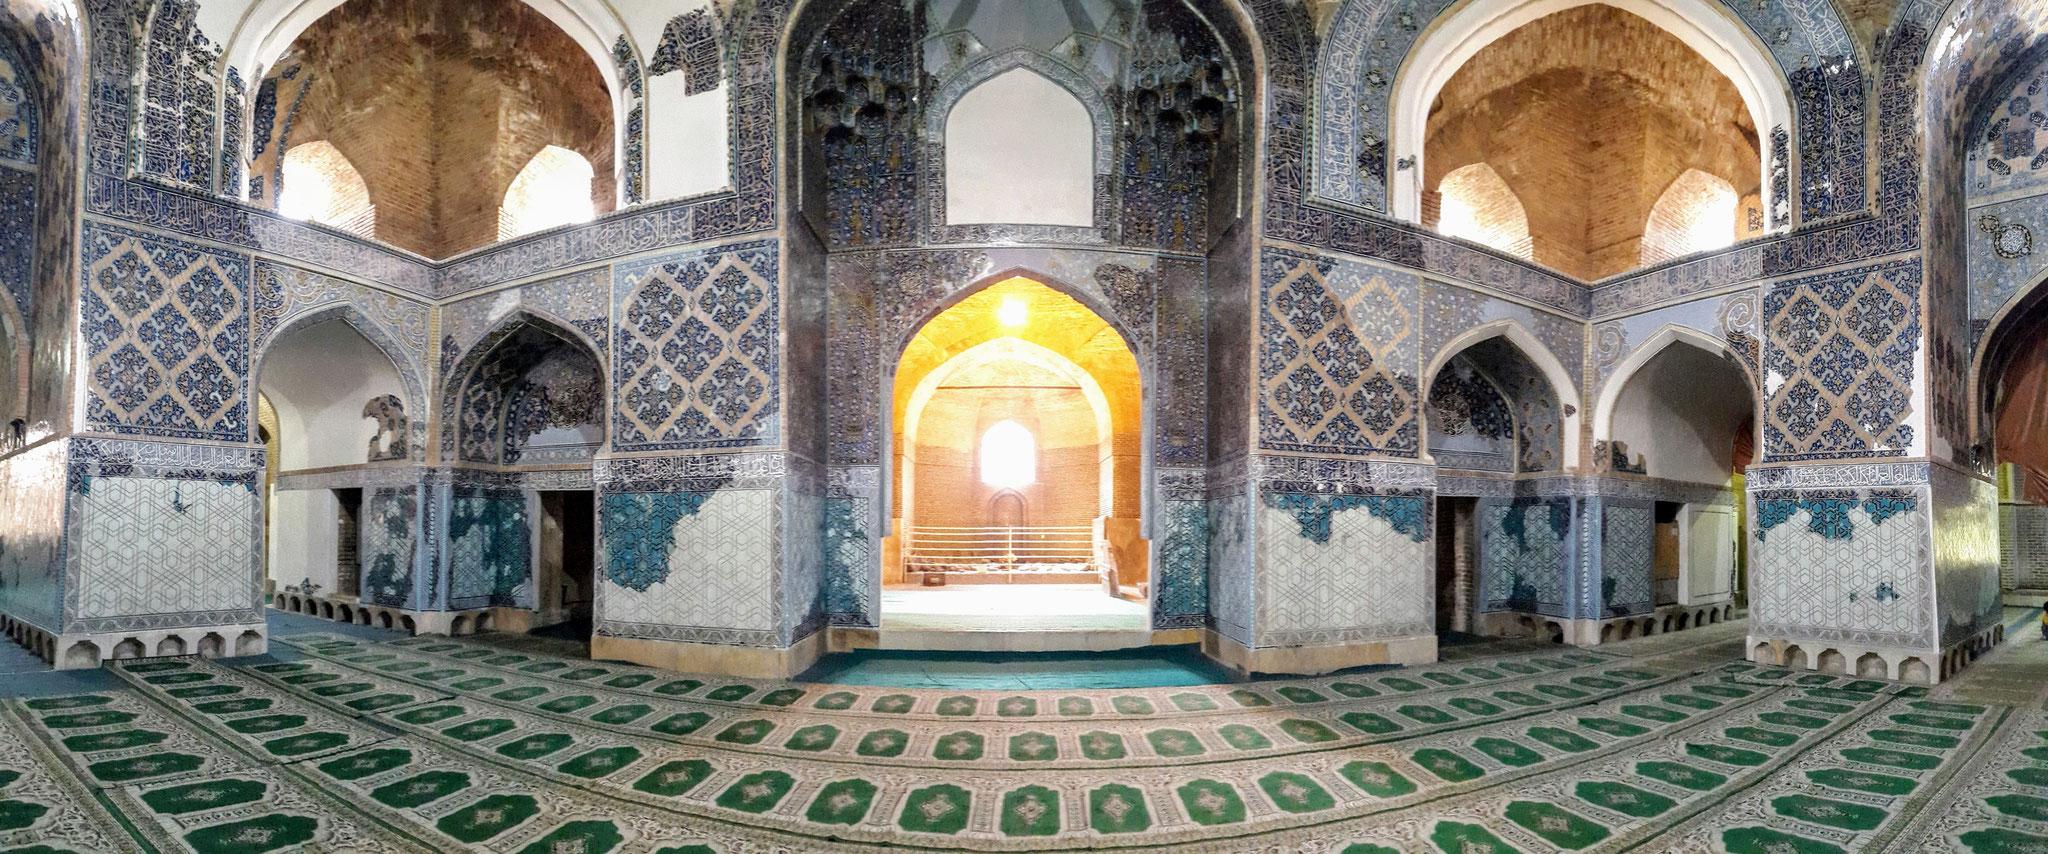 Blaue Moschee in Täbriz, Iran